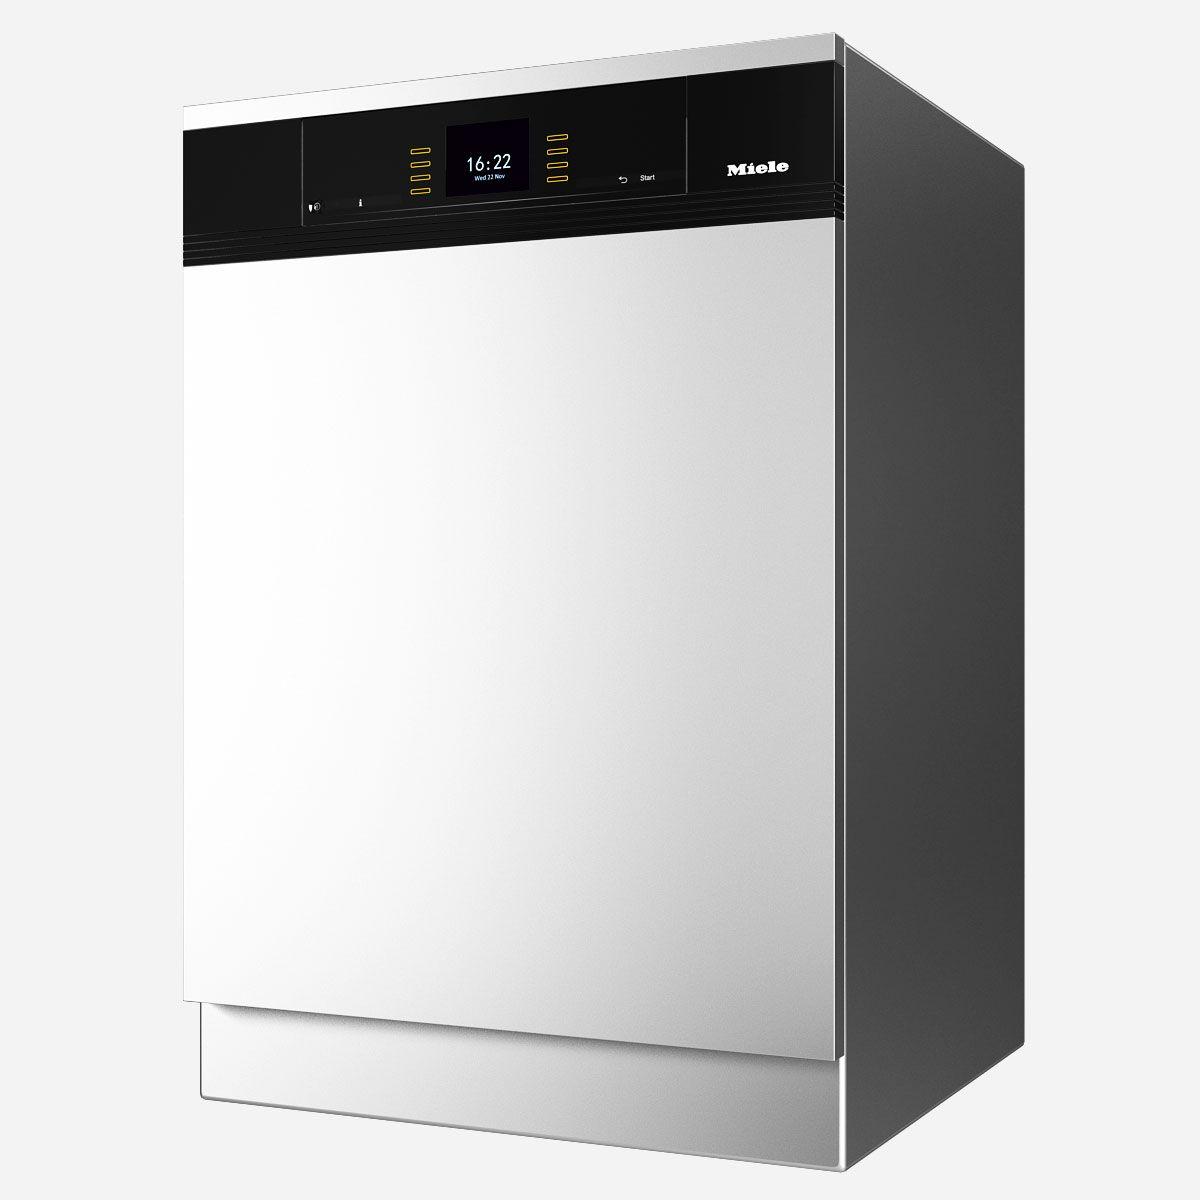 Miele G 6900 SCi Dishwasher Miele, Event poster design